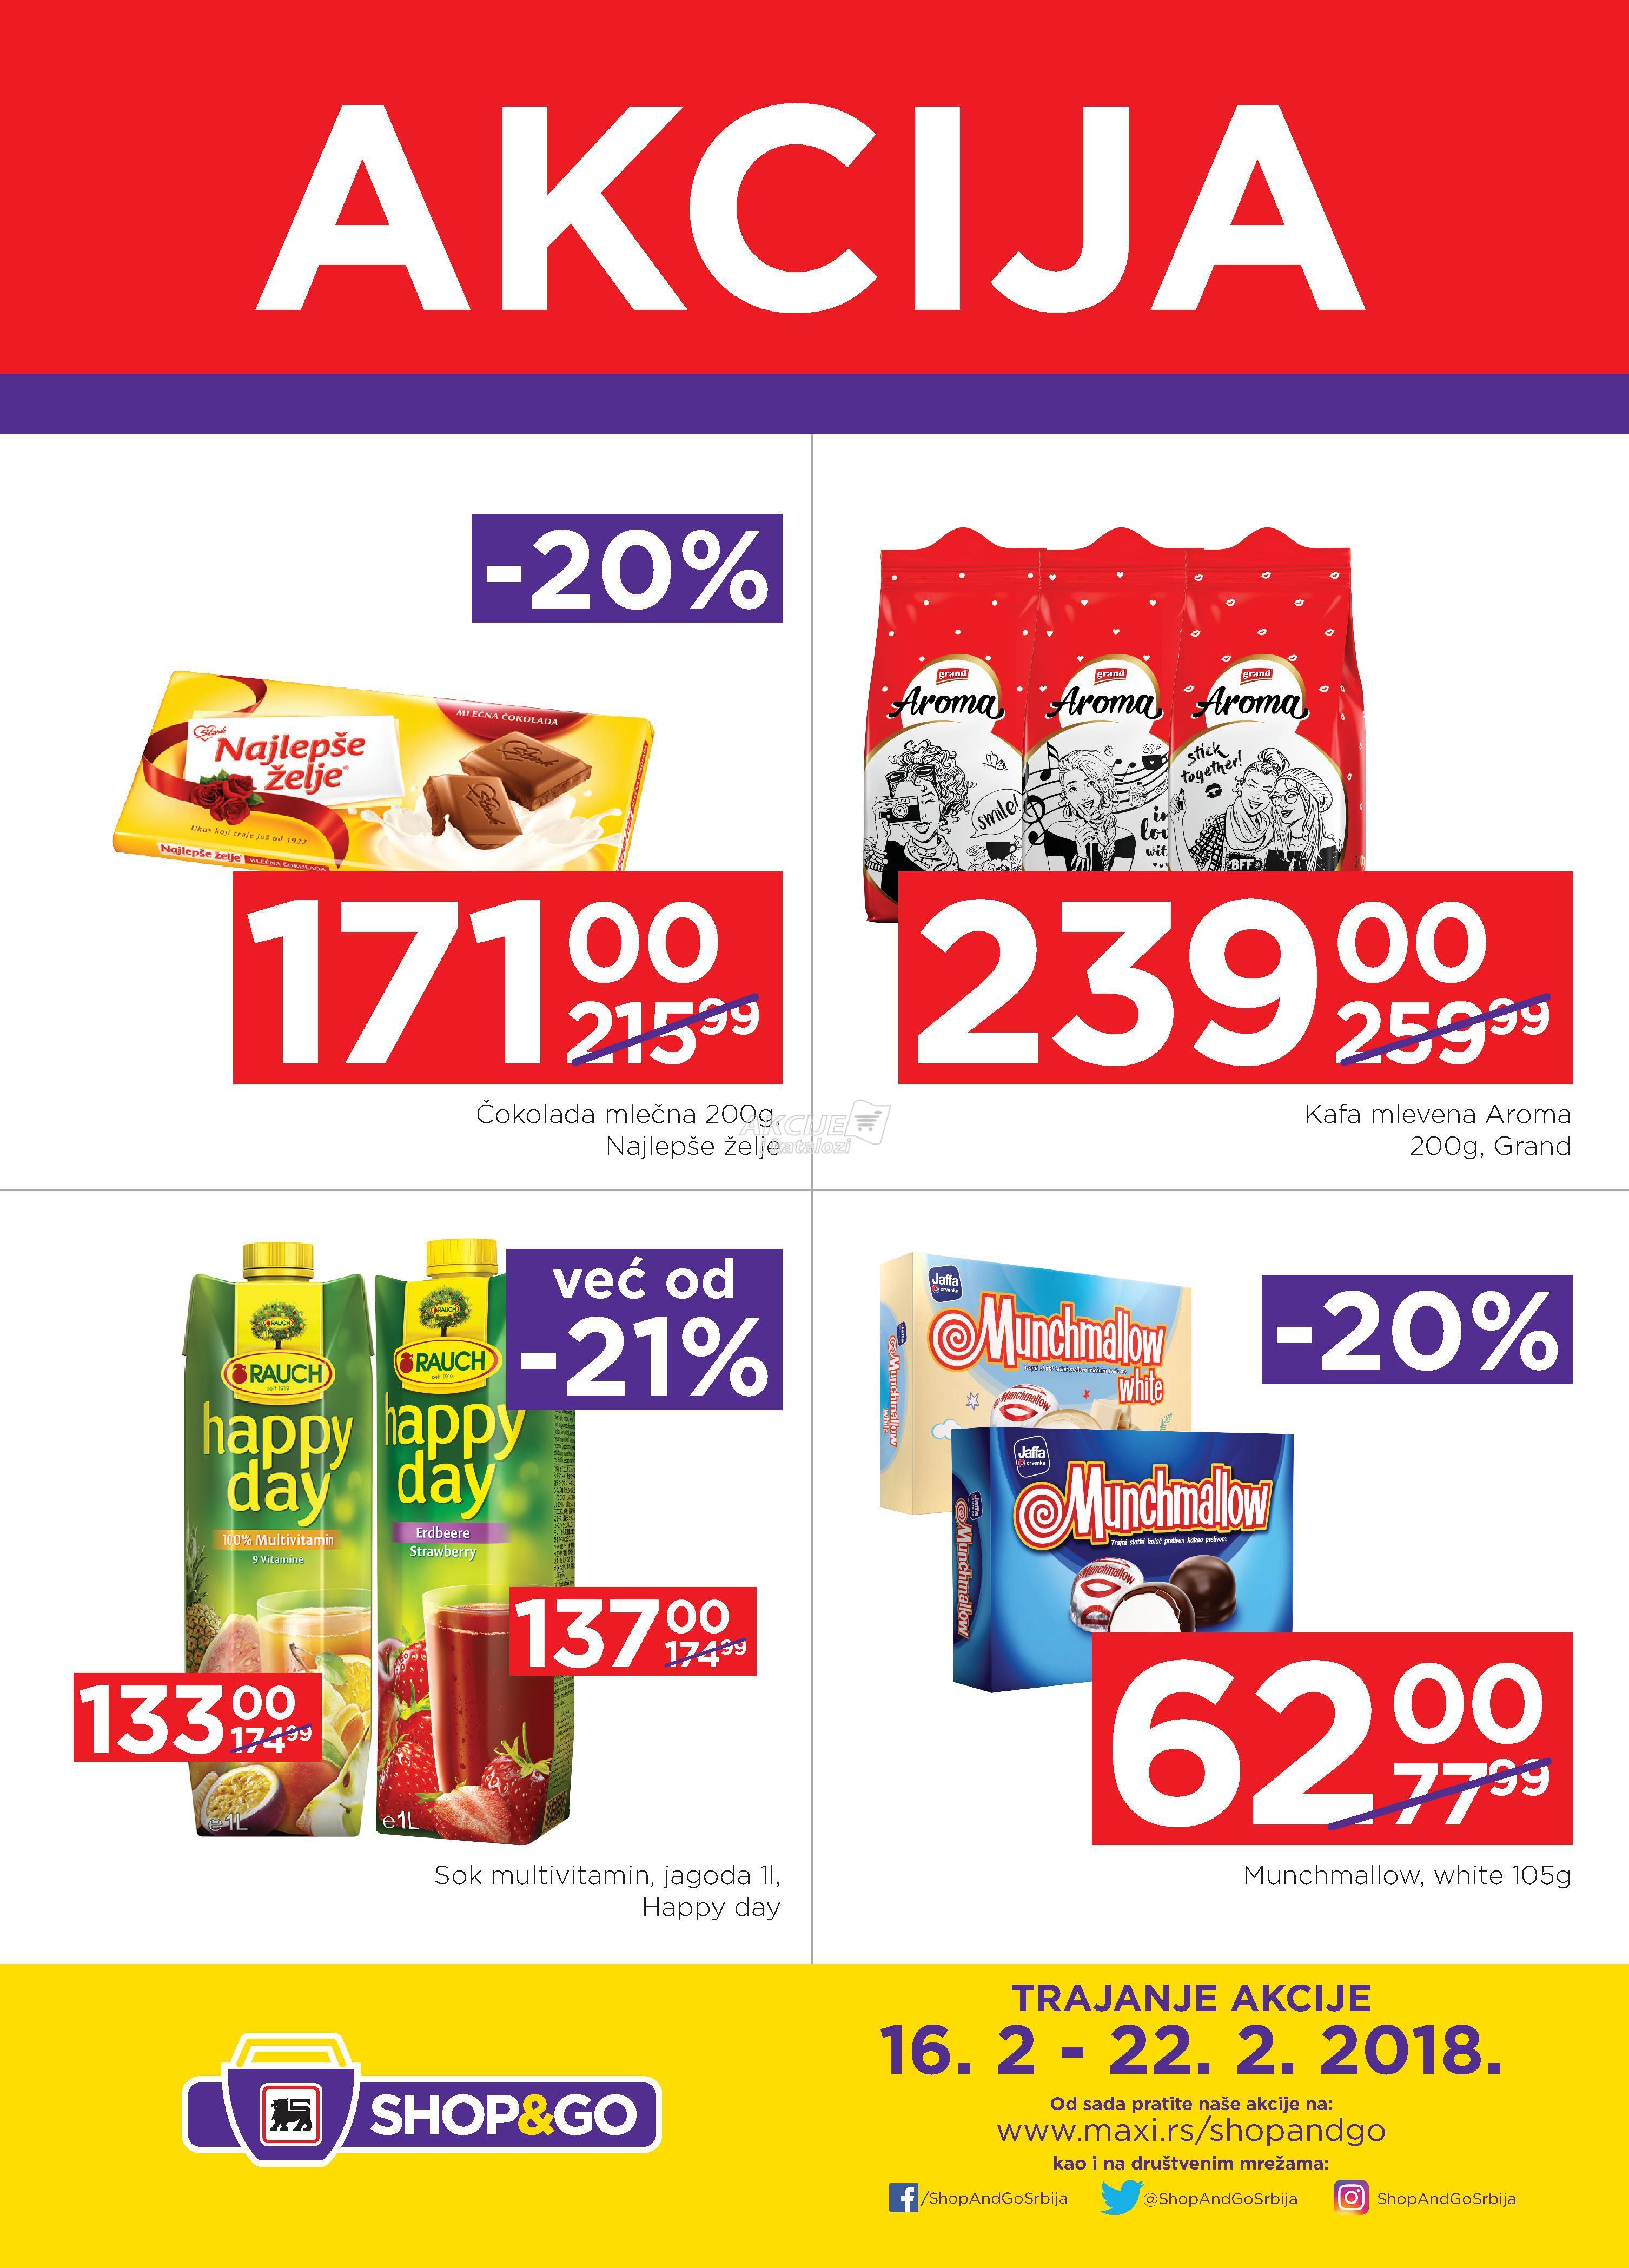 Shop&go - Redovna akcija super cena